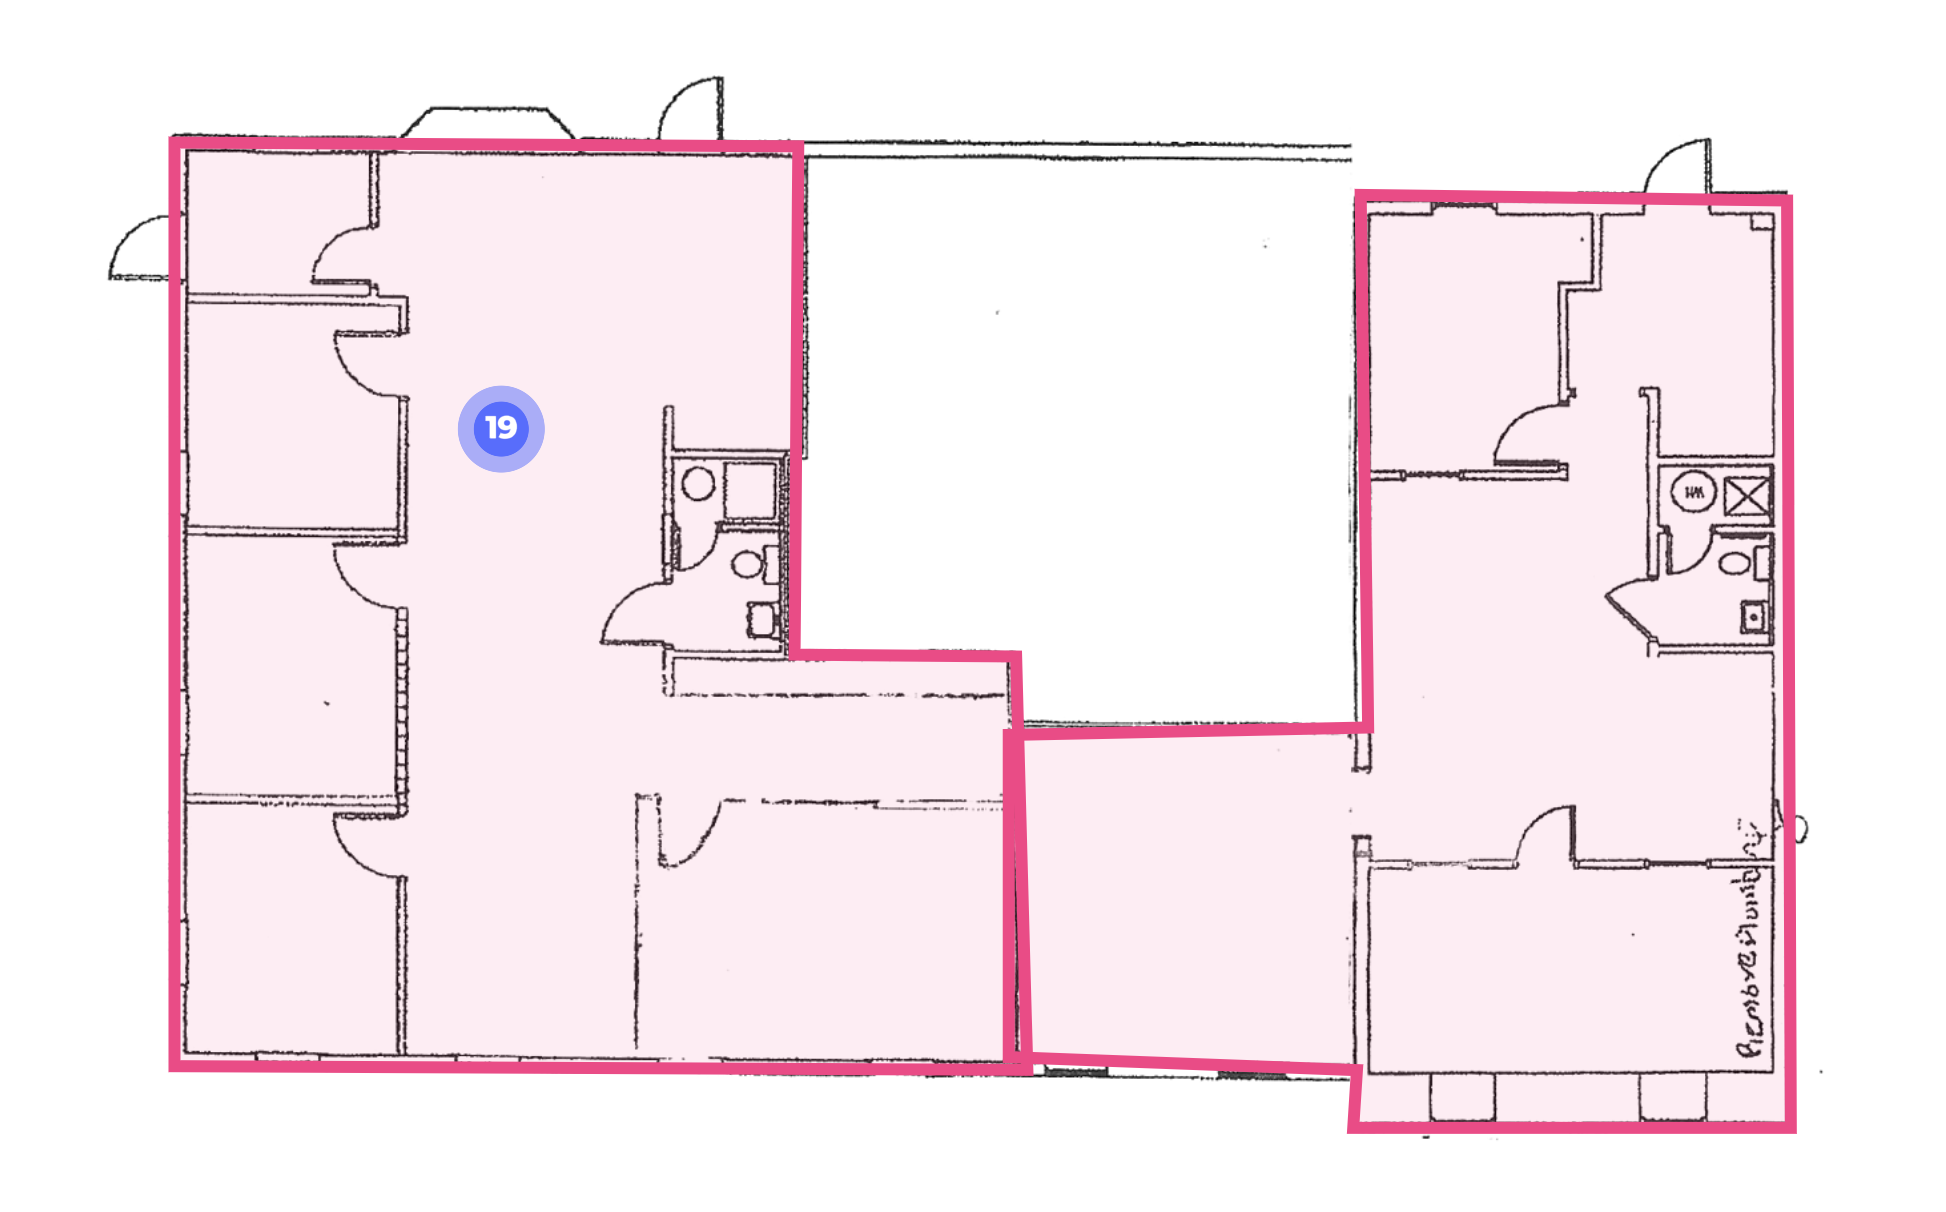 Site Planning - A 4-Tier Hierarchy - Location